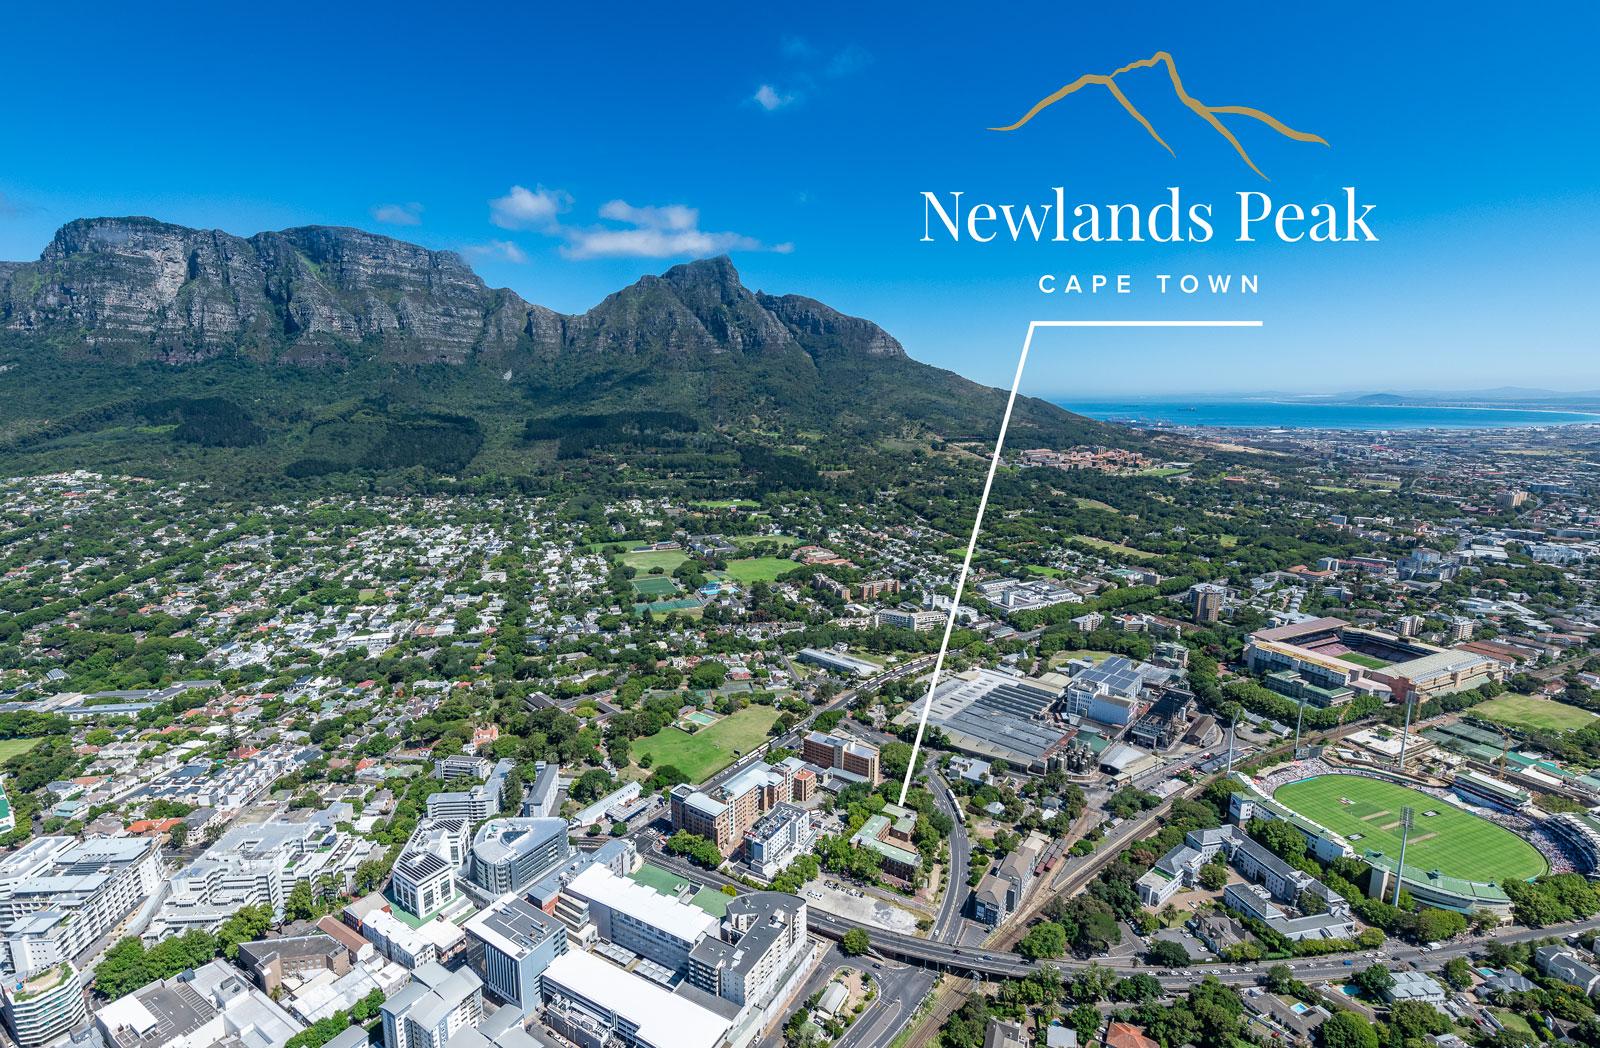 Location Marker, Newlands Peak, Rawson Developers, Luxury Cape Town Apartments